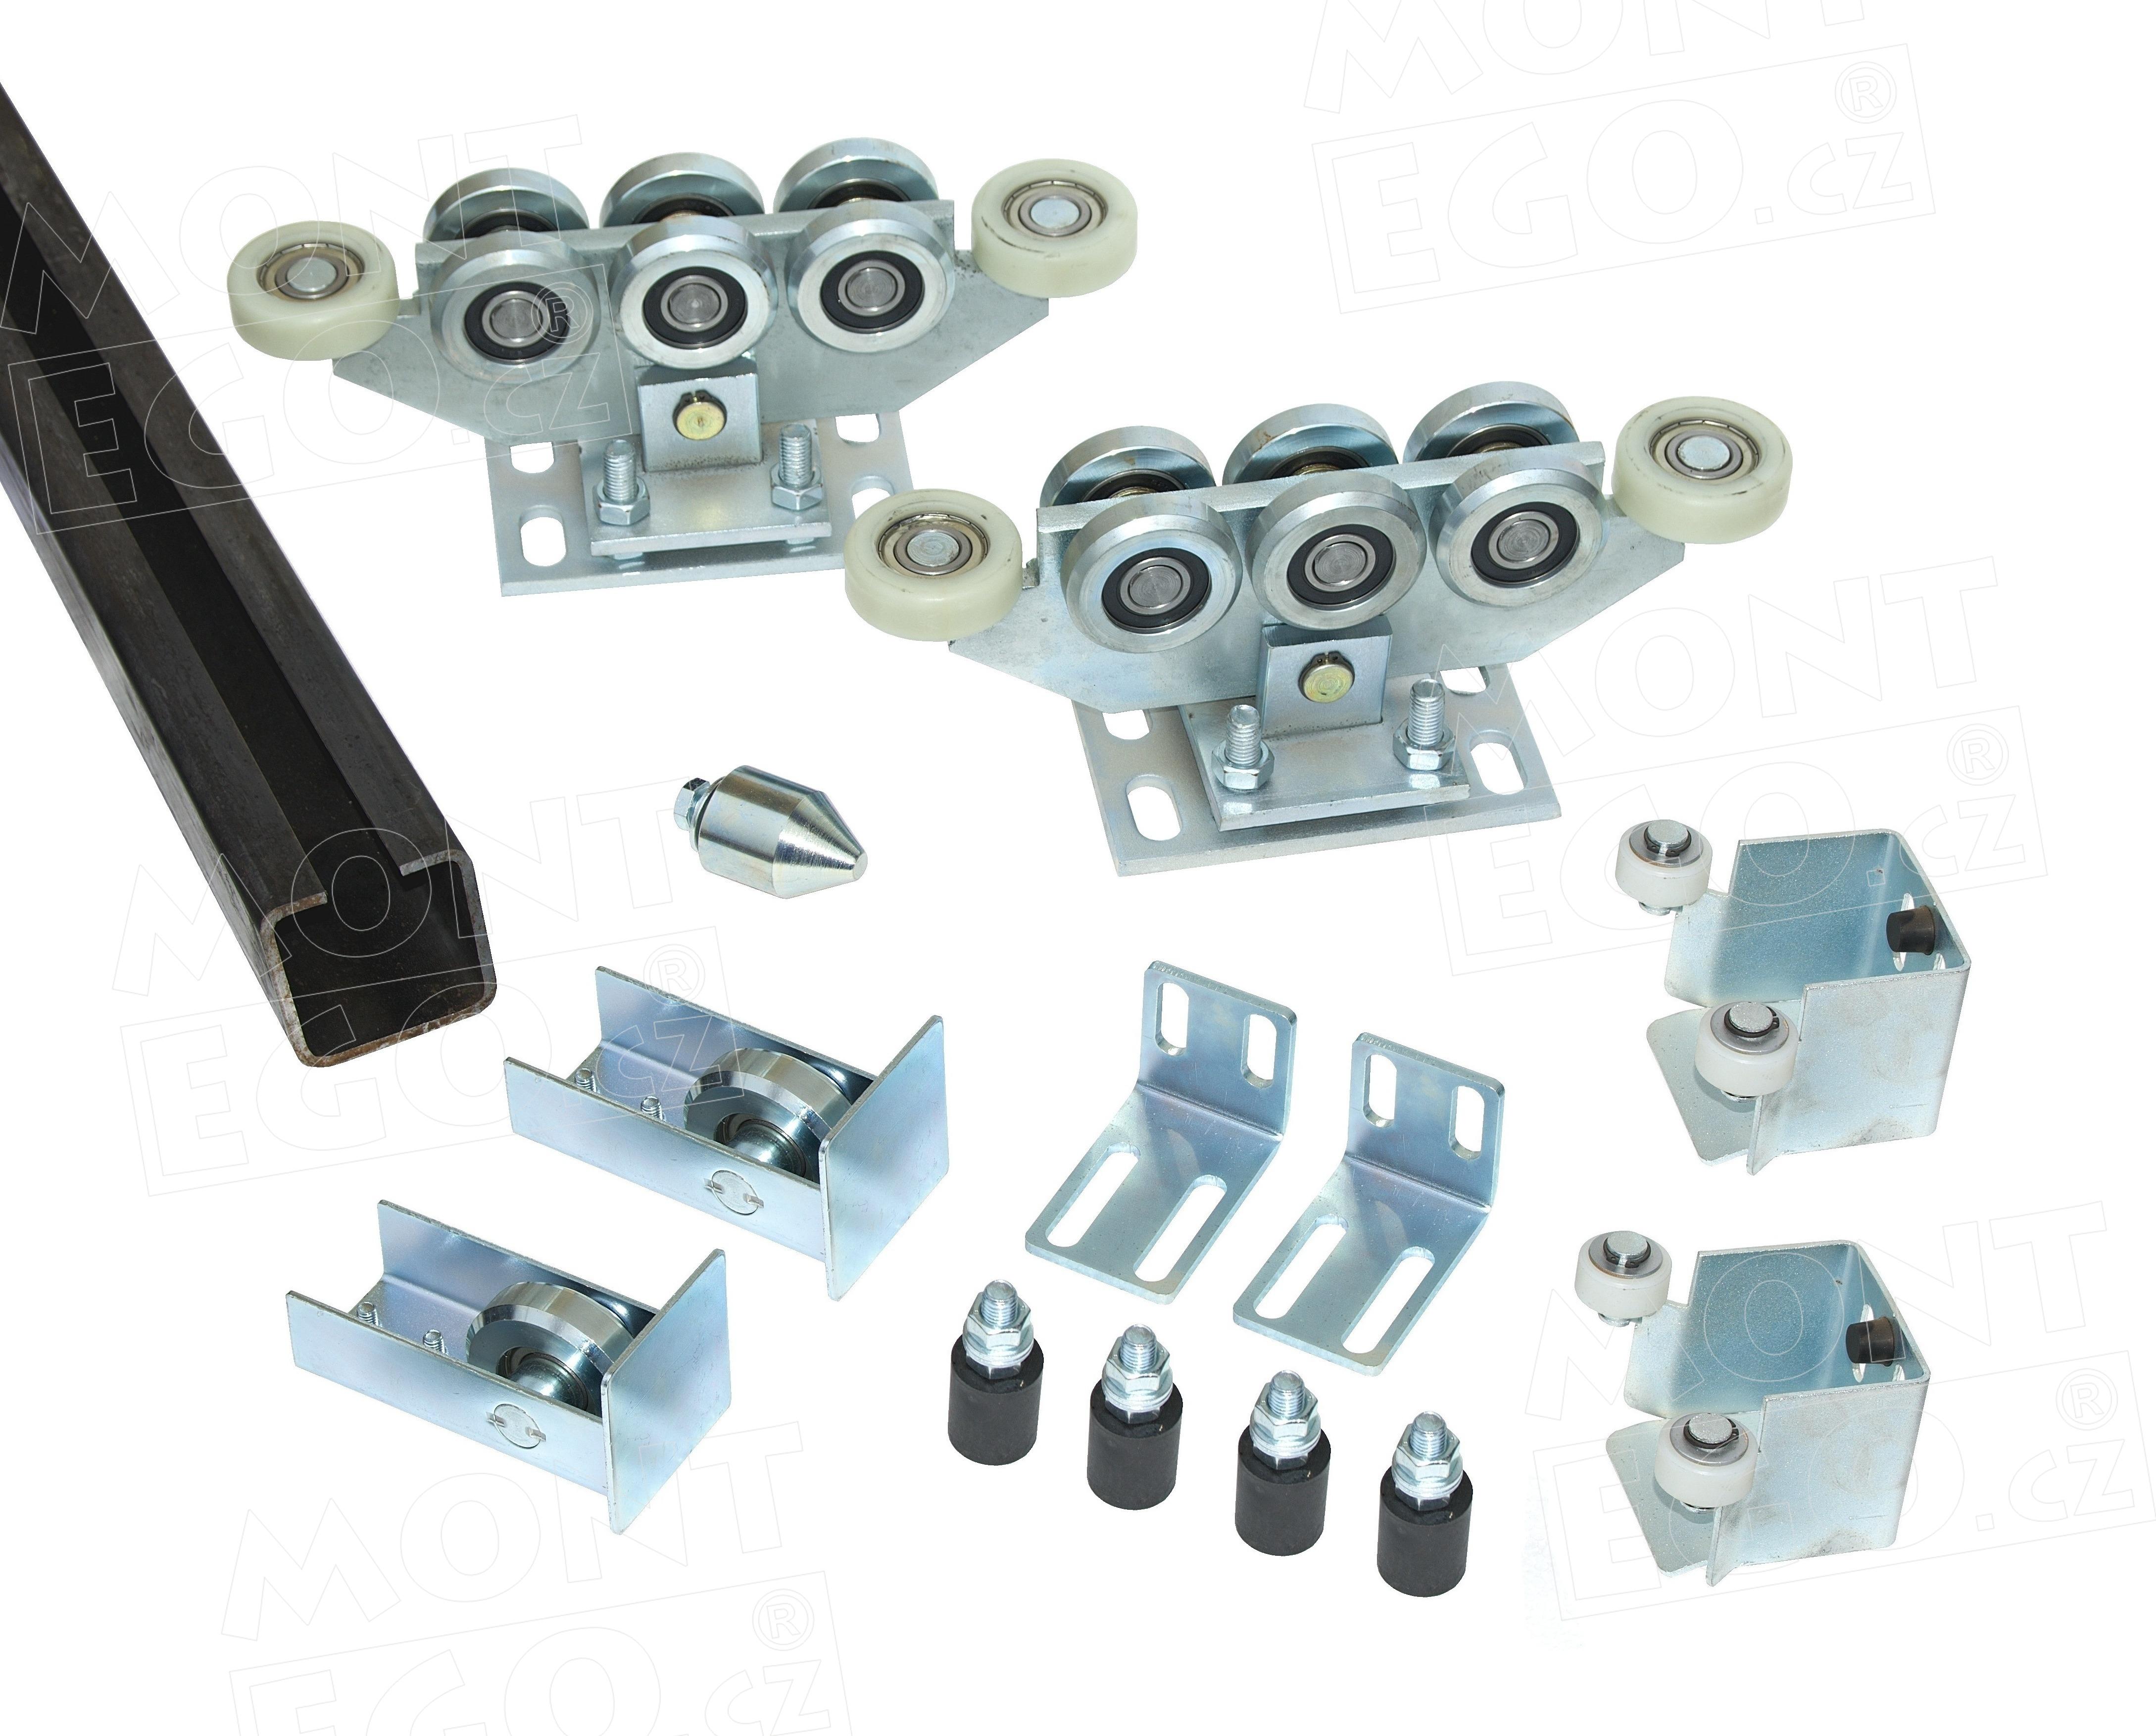 Komponenty na výrobu samonosné posuvné brány zavěšené dlouhé 6,50 m (průjezd) SK80.65 PLUS